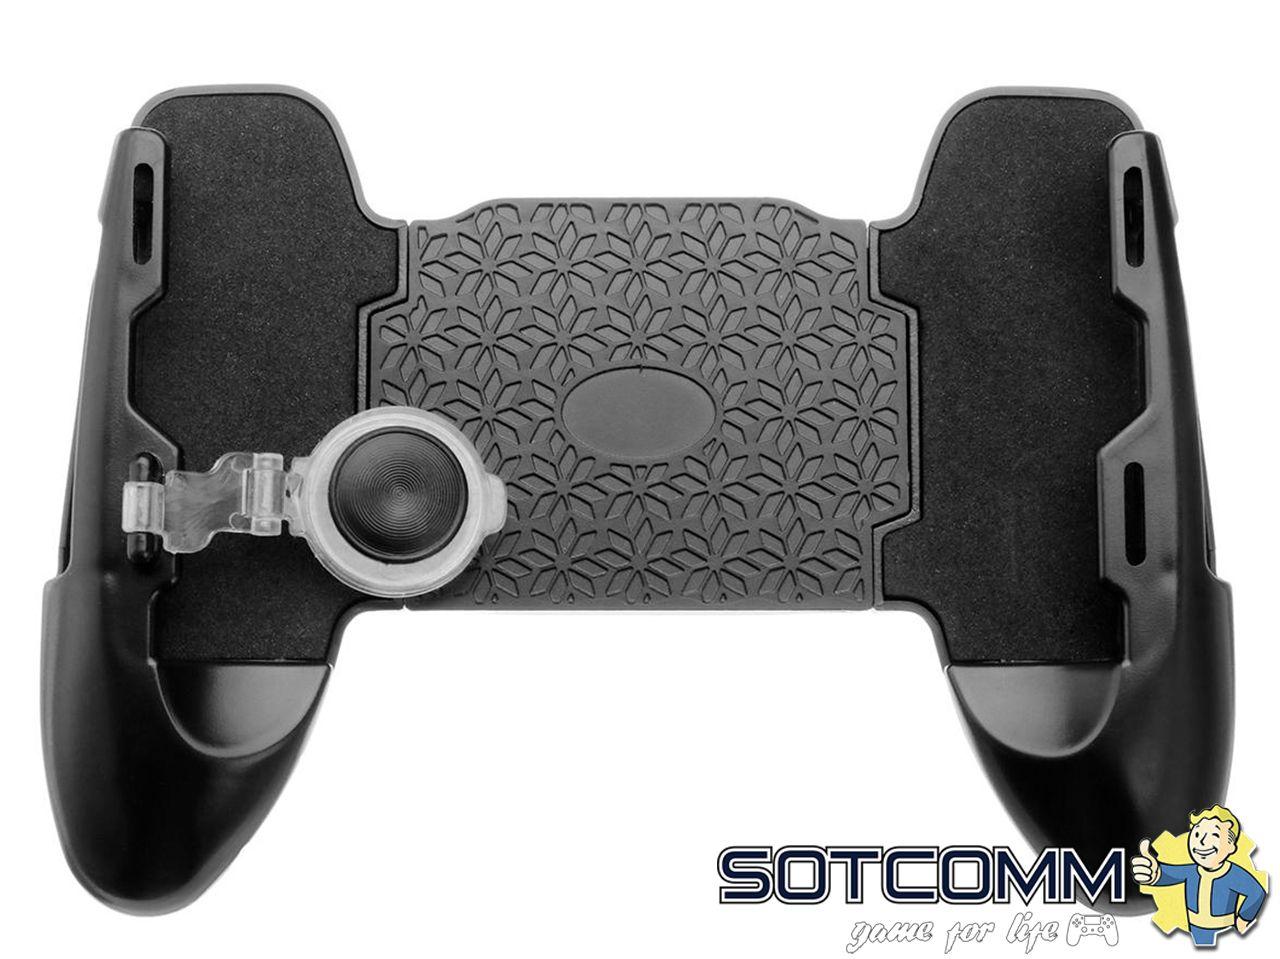 Геймпад (джойстик) для телефона Portable Gamepad 3in1